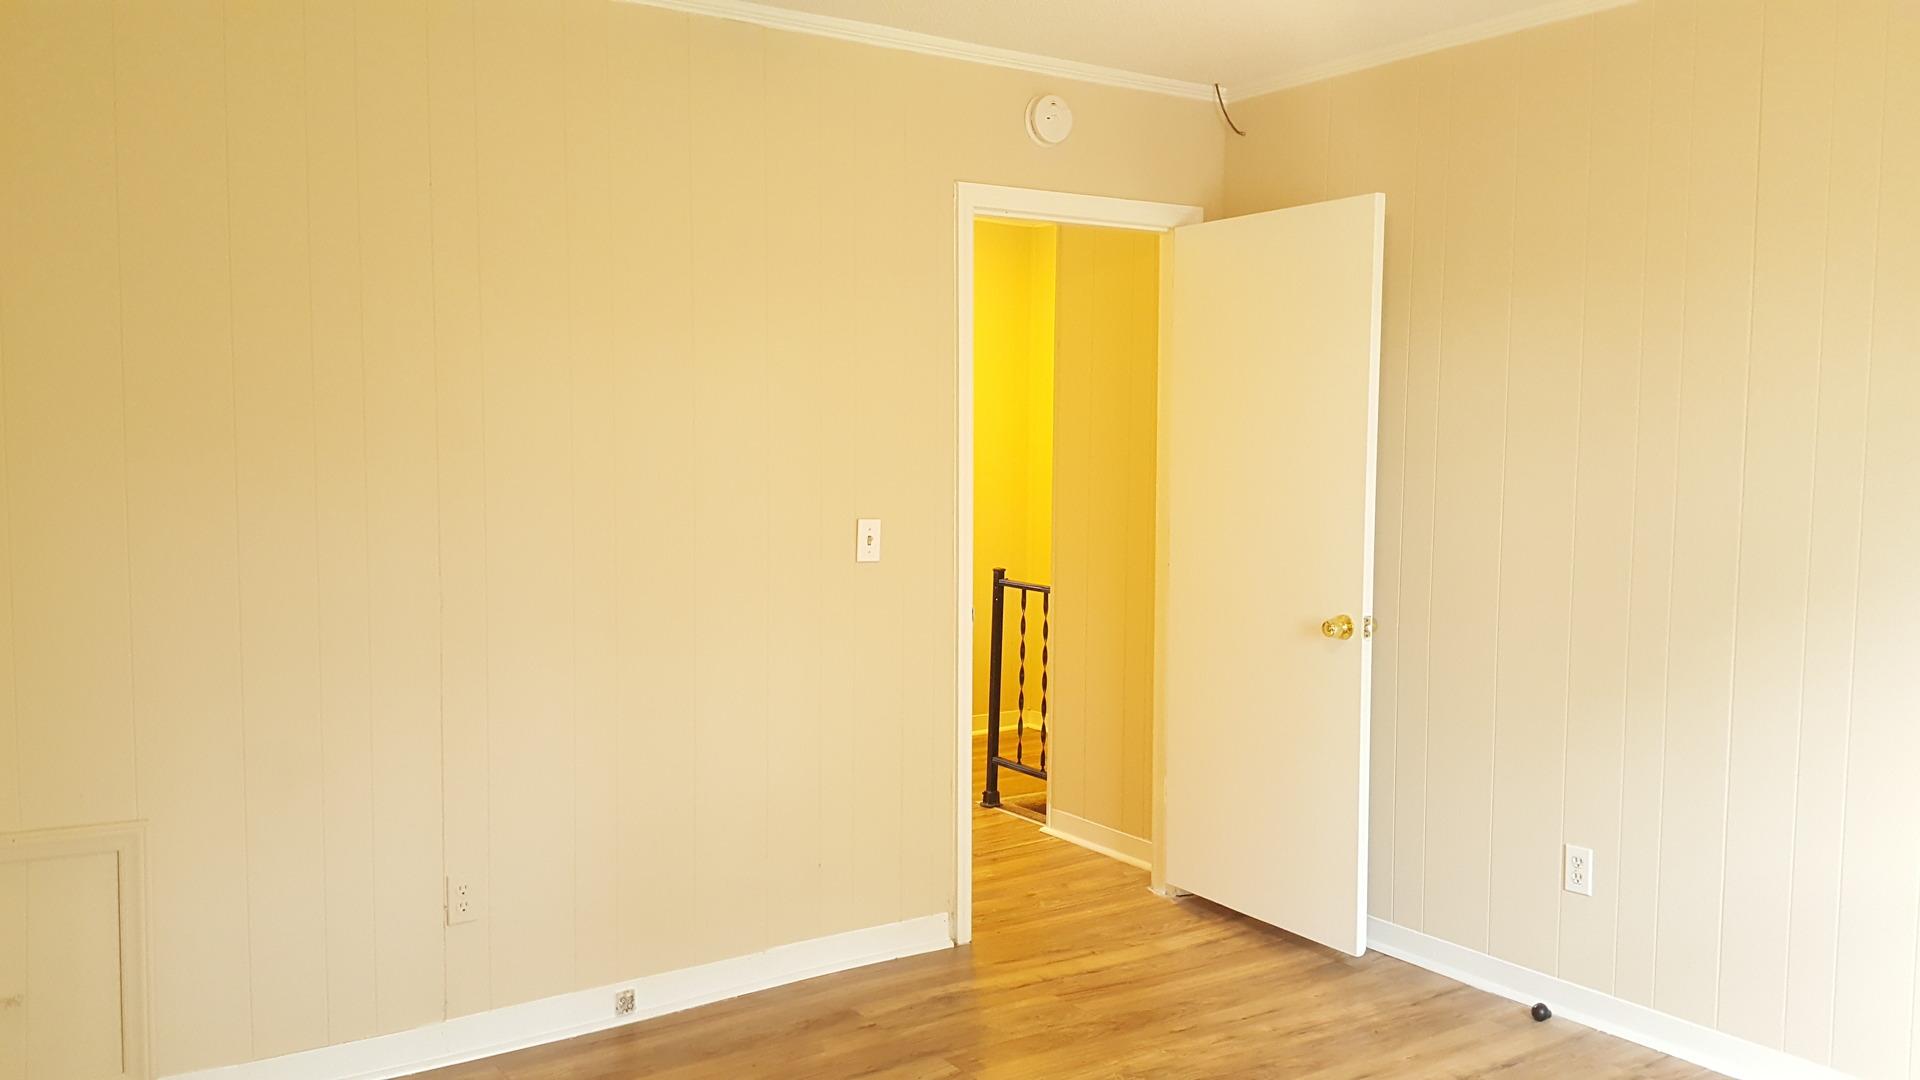 2 Bedroom Townhome W/ Wood Floors Myrtle Beach,SC